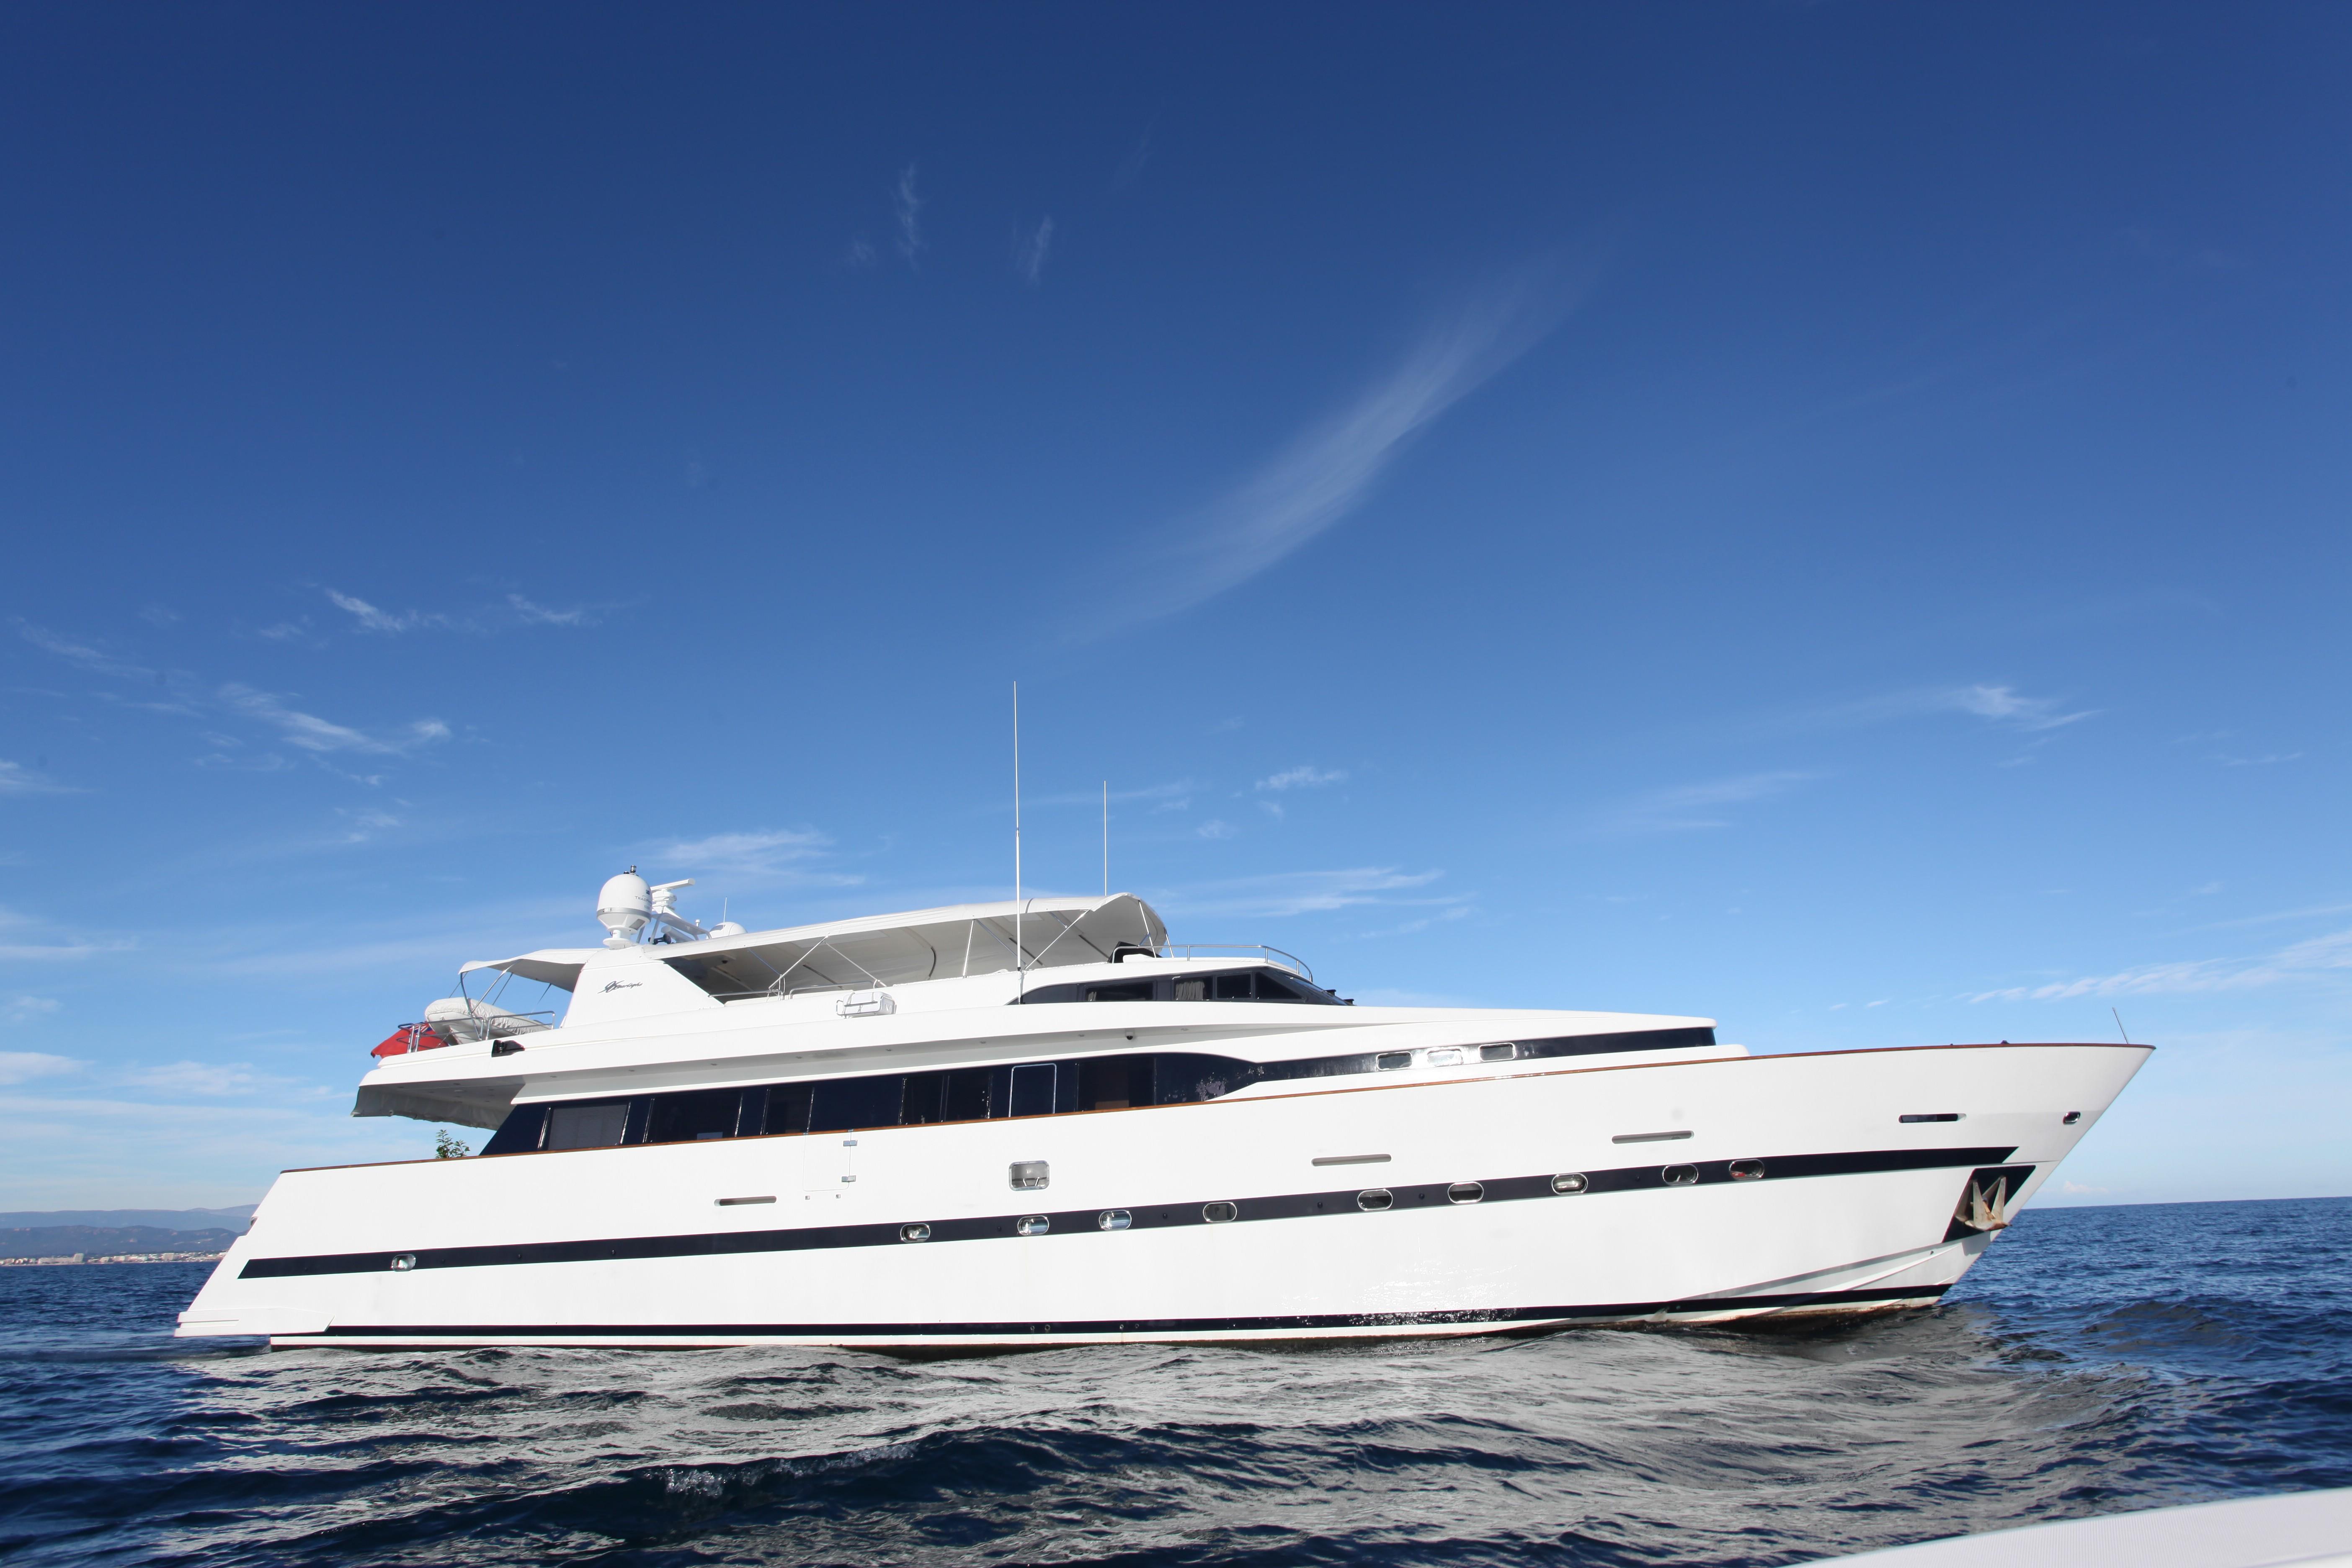 moondance yacht charter details  azimut charterworld cream leather sofas uk cream leather sofas and chairs